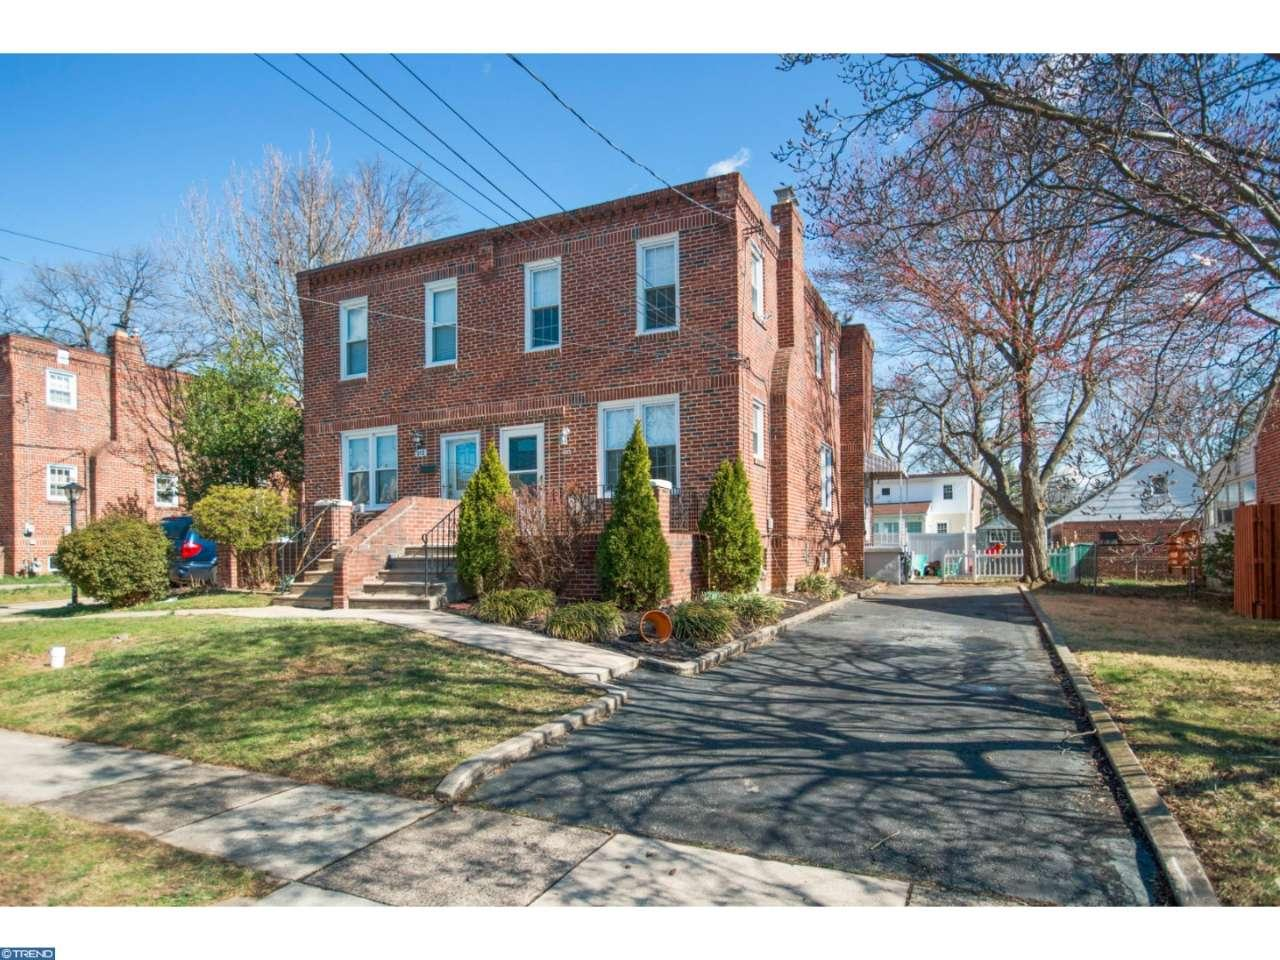 210 Hazel Ave, Folsom, PA 19033